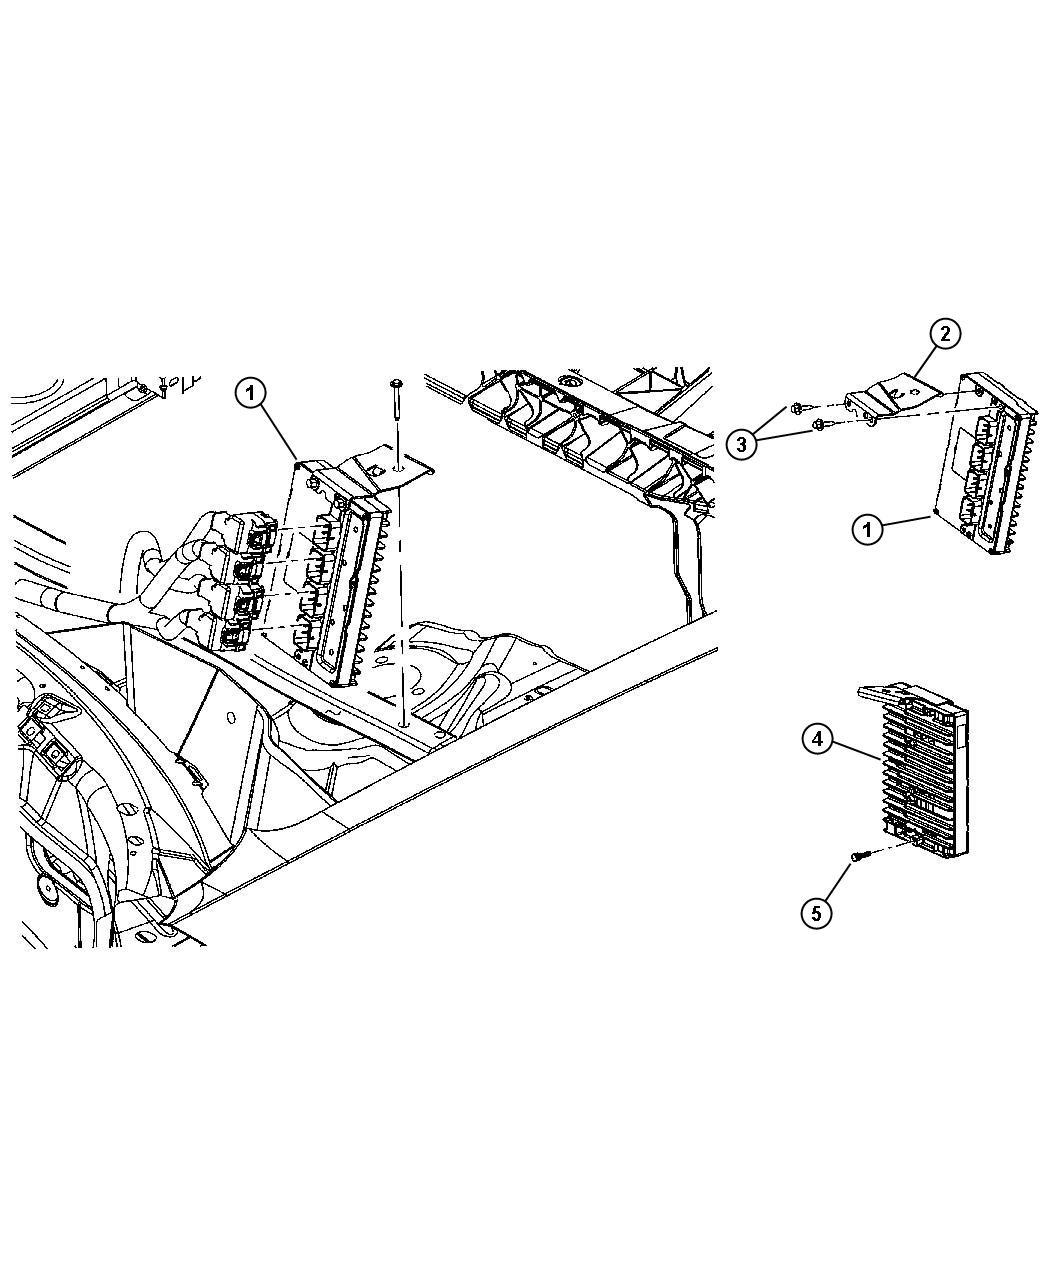 Dodge Magnum Module. Powertrain control. Generic